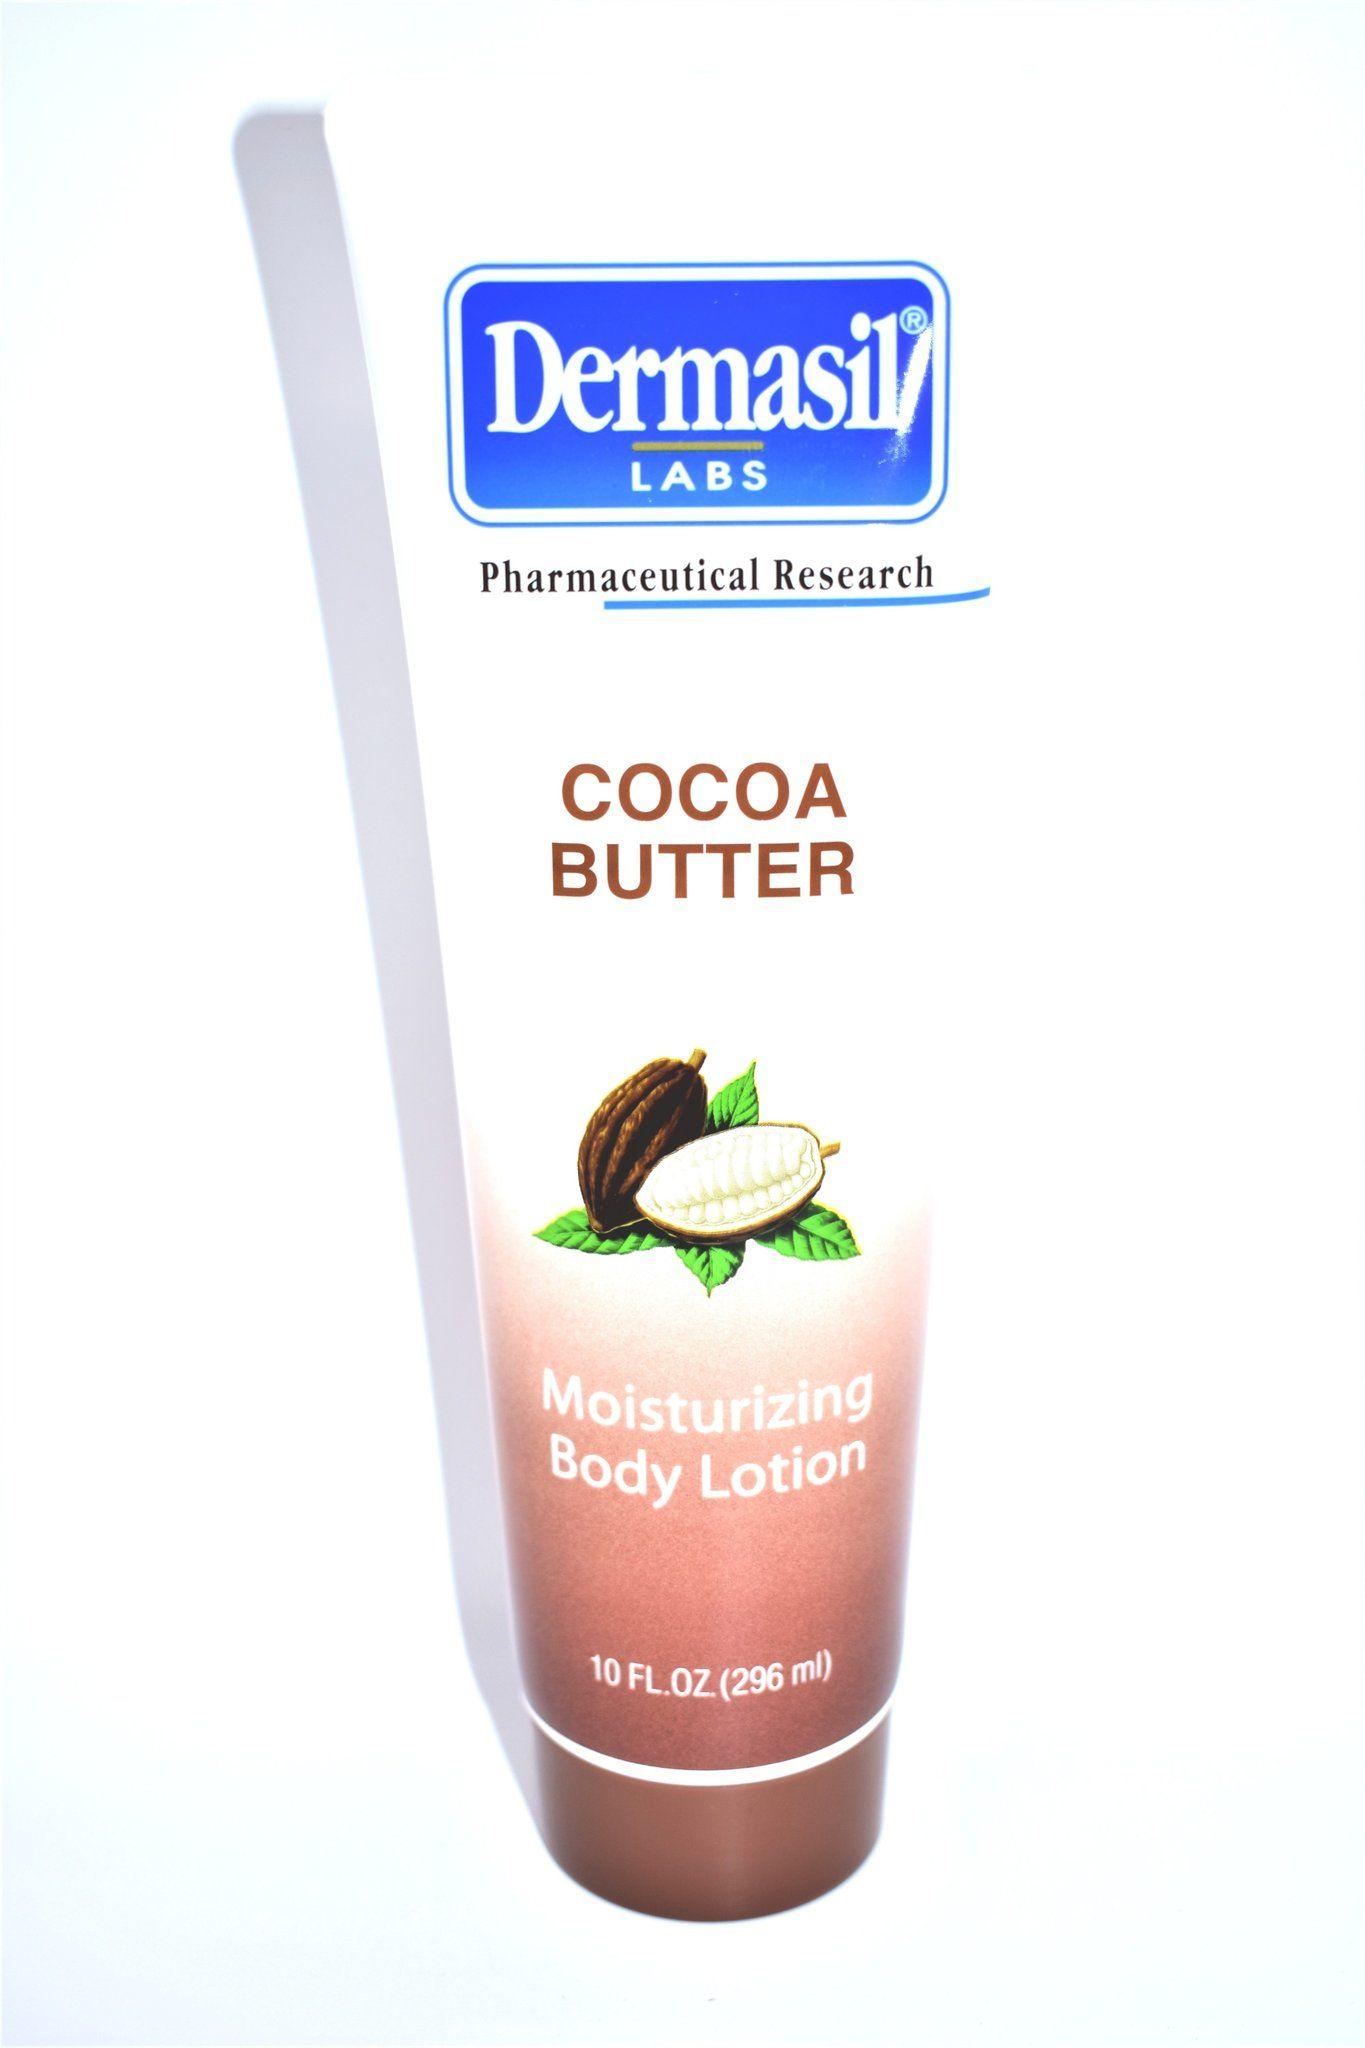 Dermasil Labs Cocoa Butter Moisturizing Body Lotion 10 Fl Oz Body Lotion Moisturizing Body Lotion Cocoa Butter